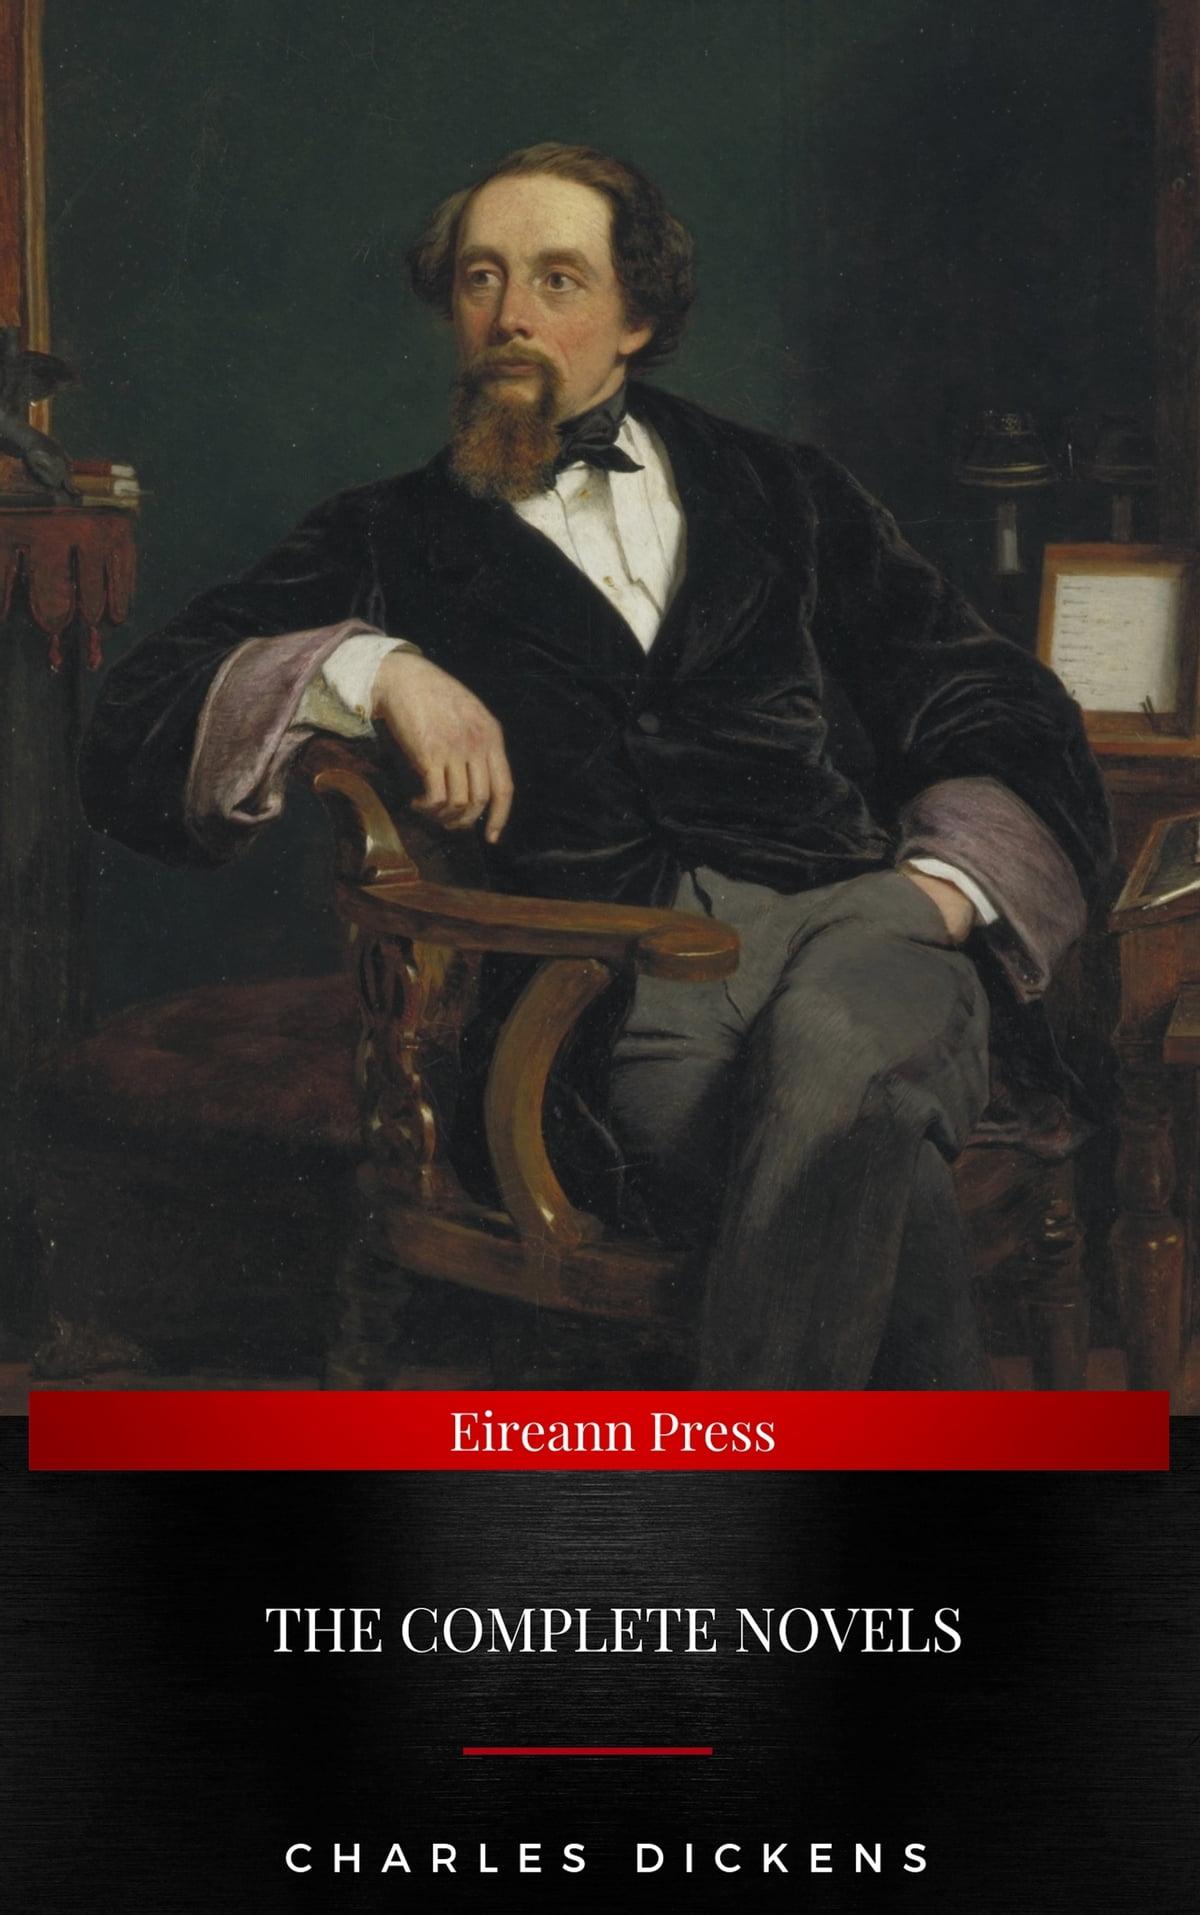 Charles Dickens The Complete Novels Golden Deer Classics